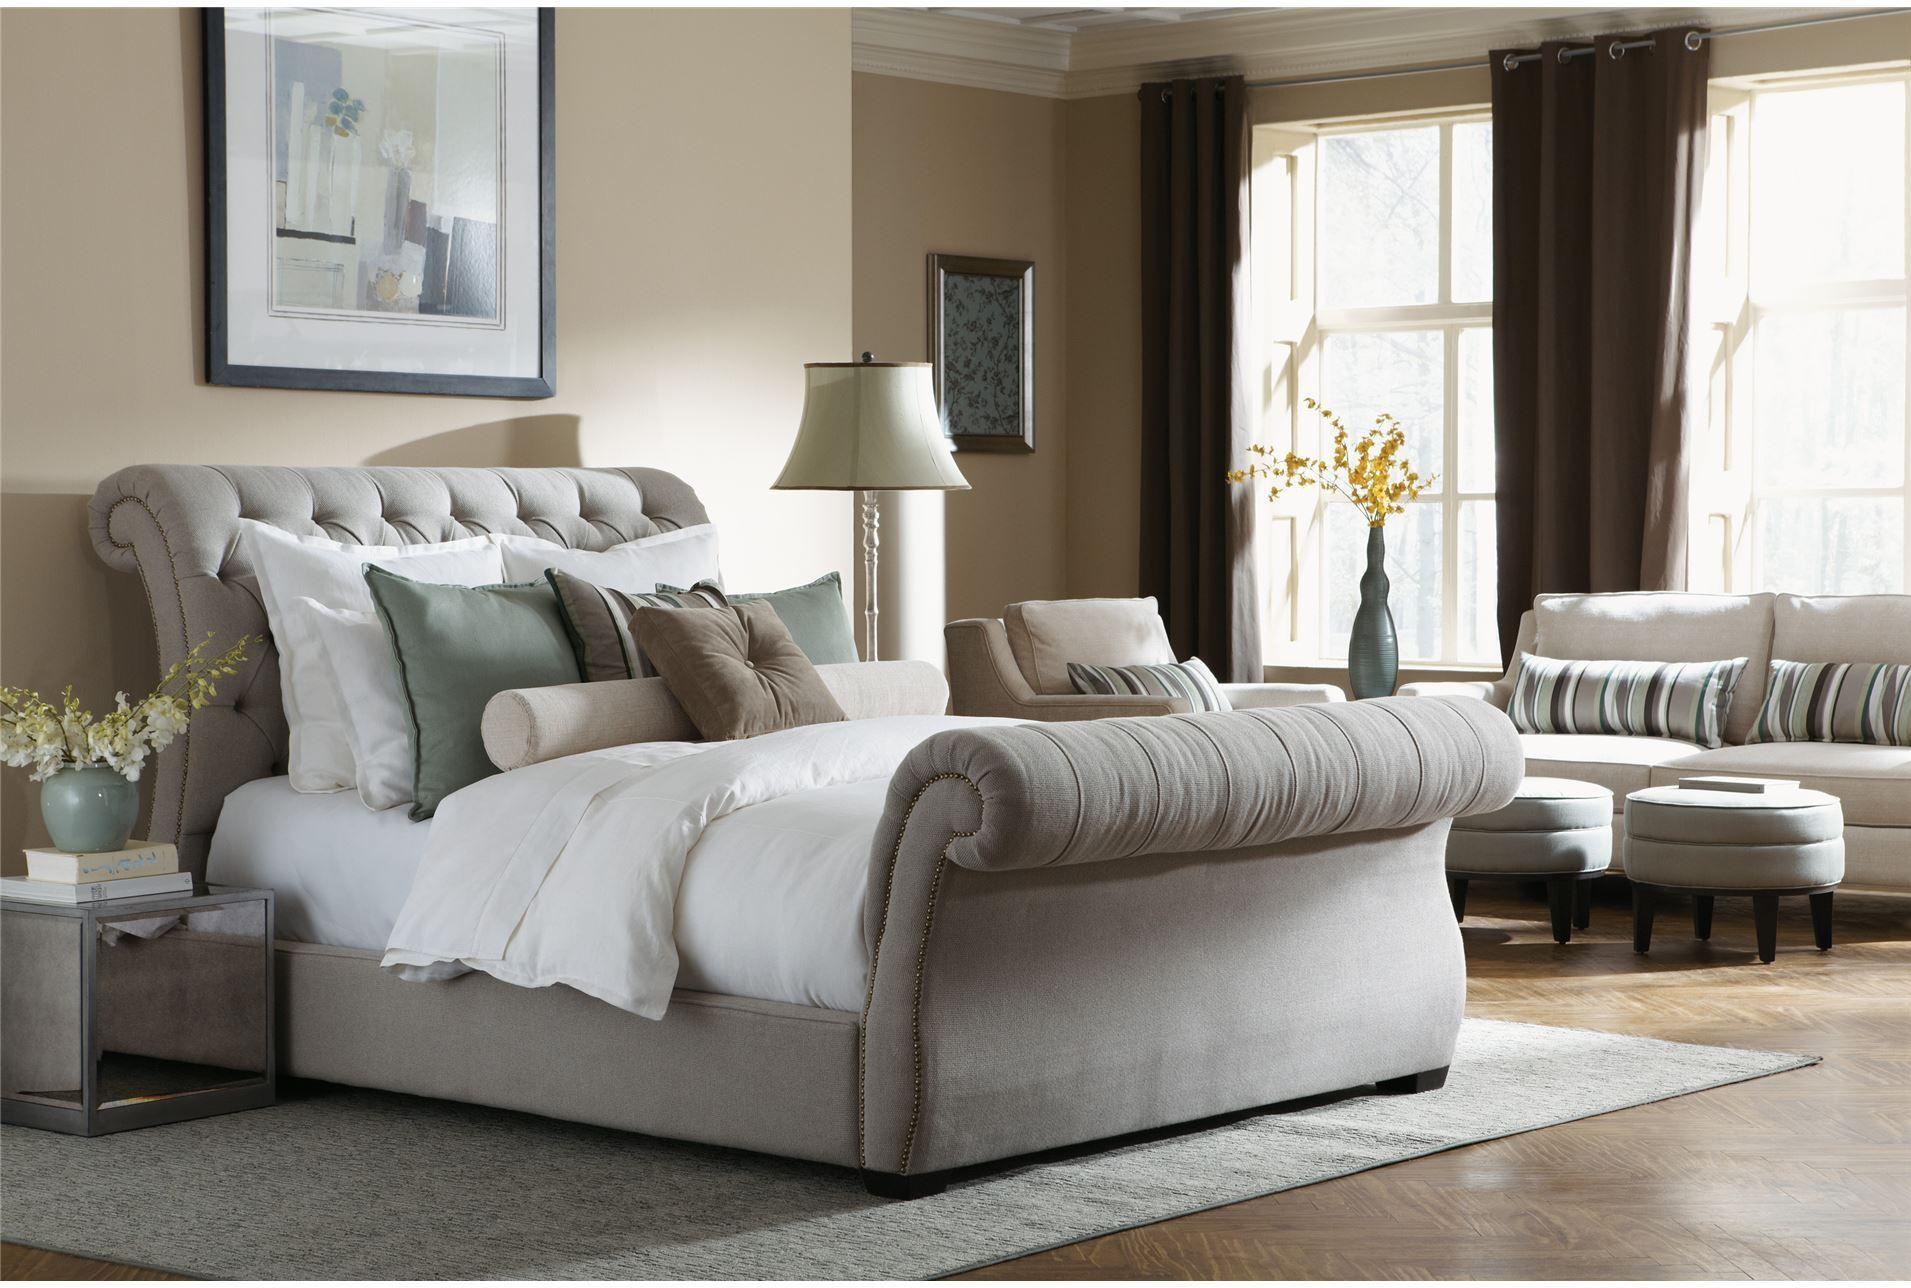 Kensington Eastern King Upholstered Sleigh Bed Signature Decor